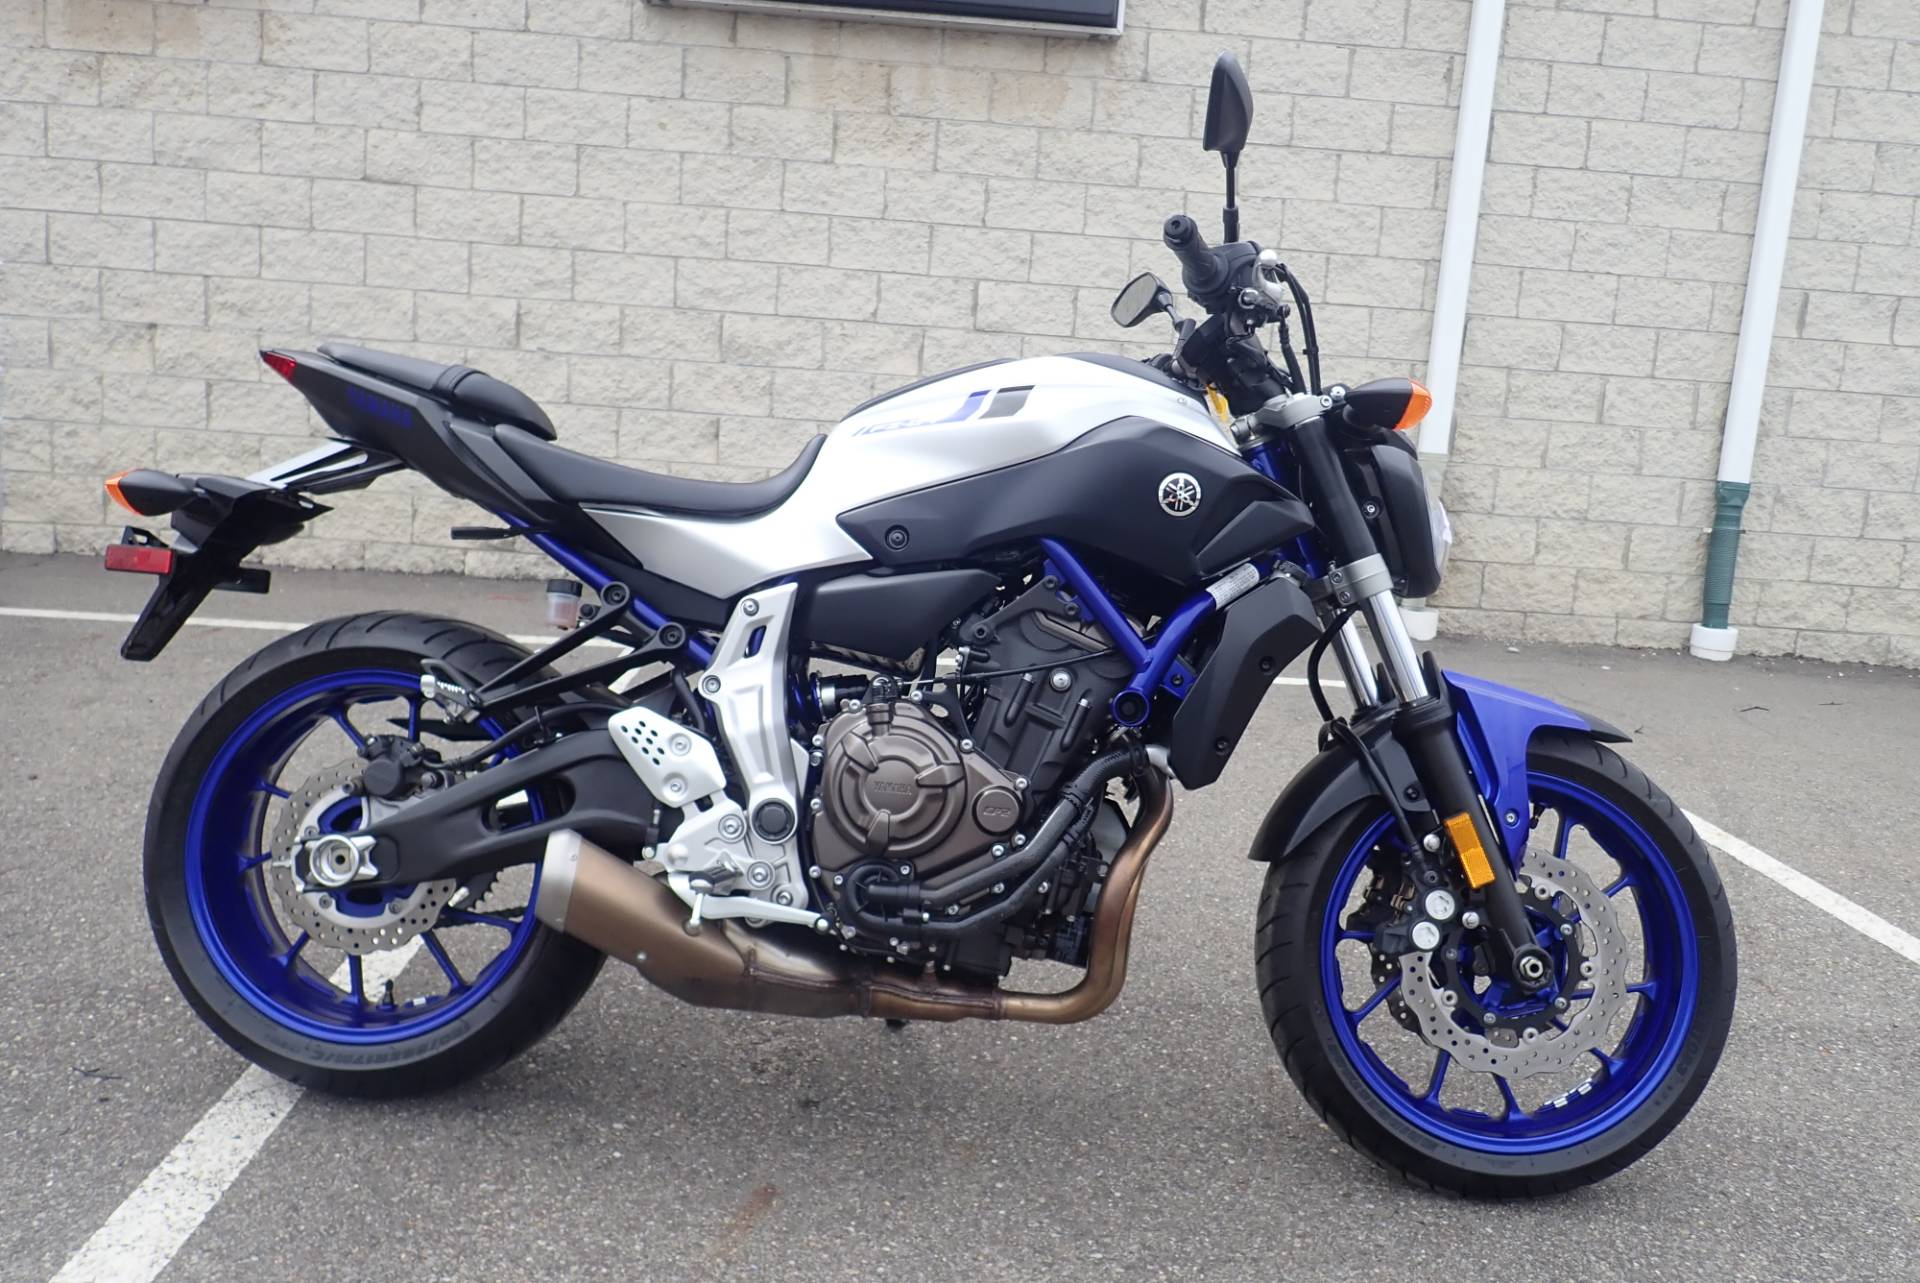 2016 Yamaha FZ-07 for sale 103941